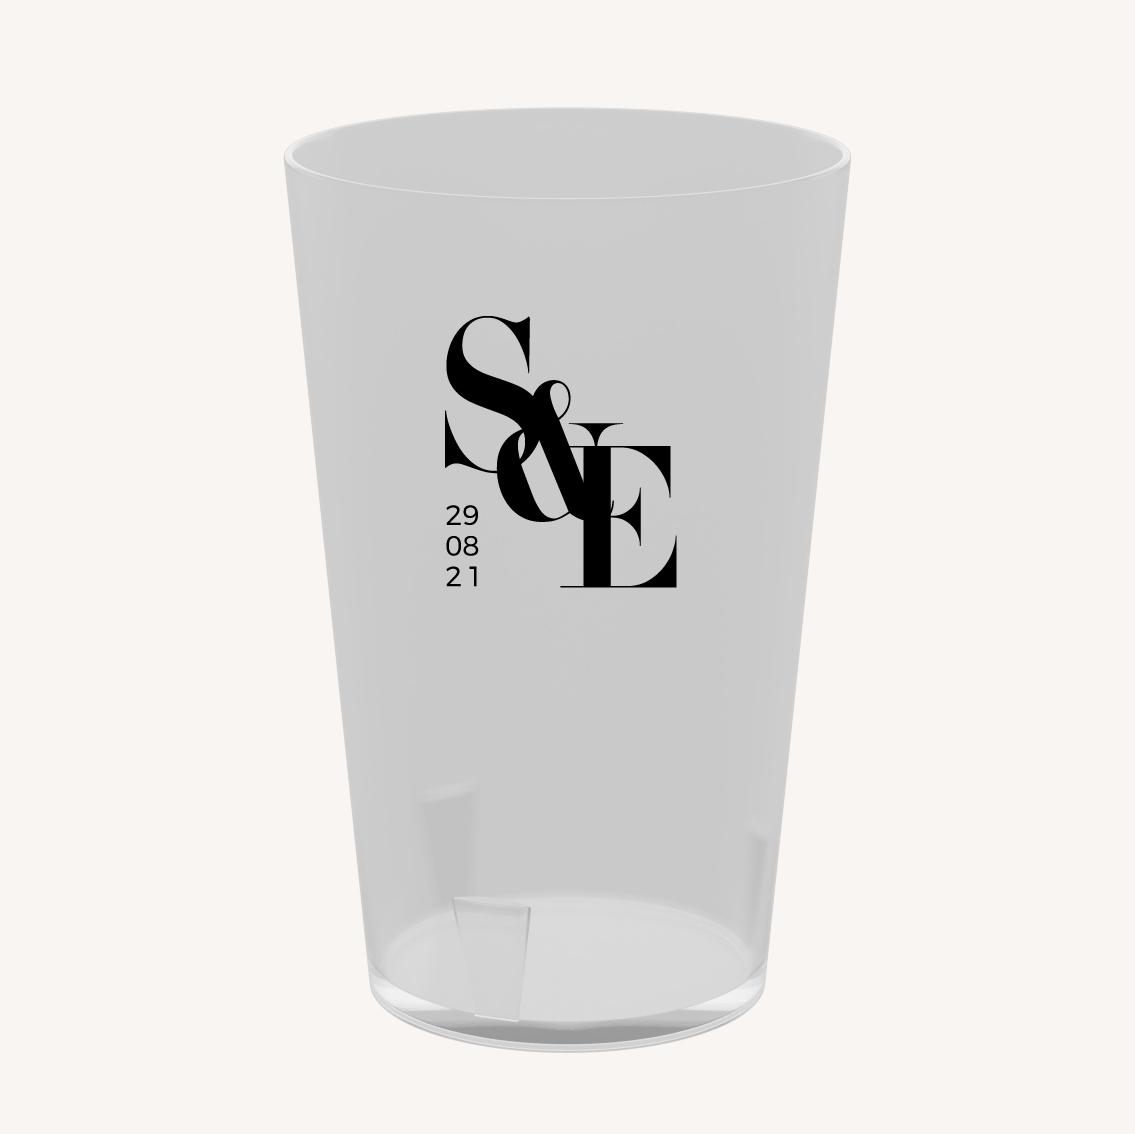 Gobelet réutilisable black and white noir et blanc moderne lettering innovant graphique